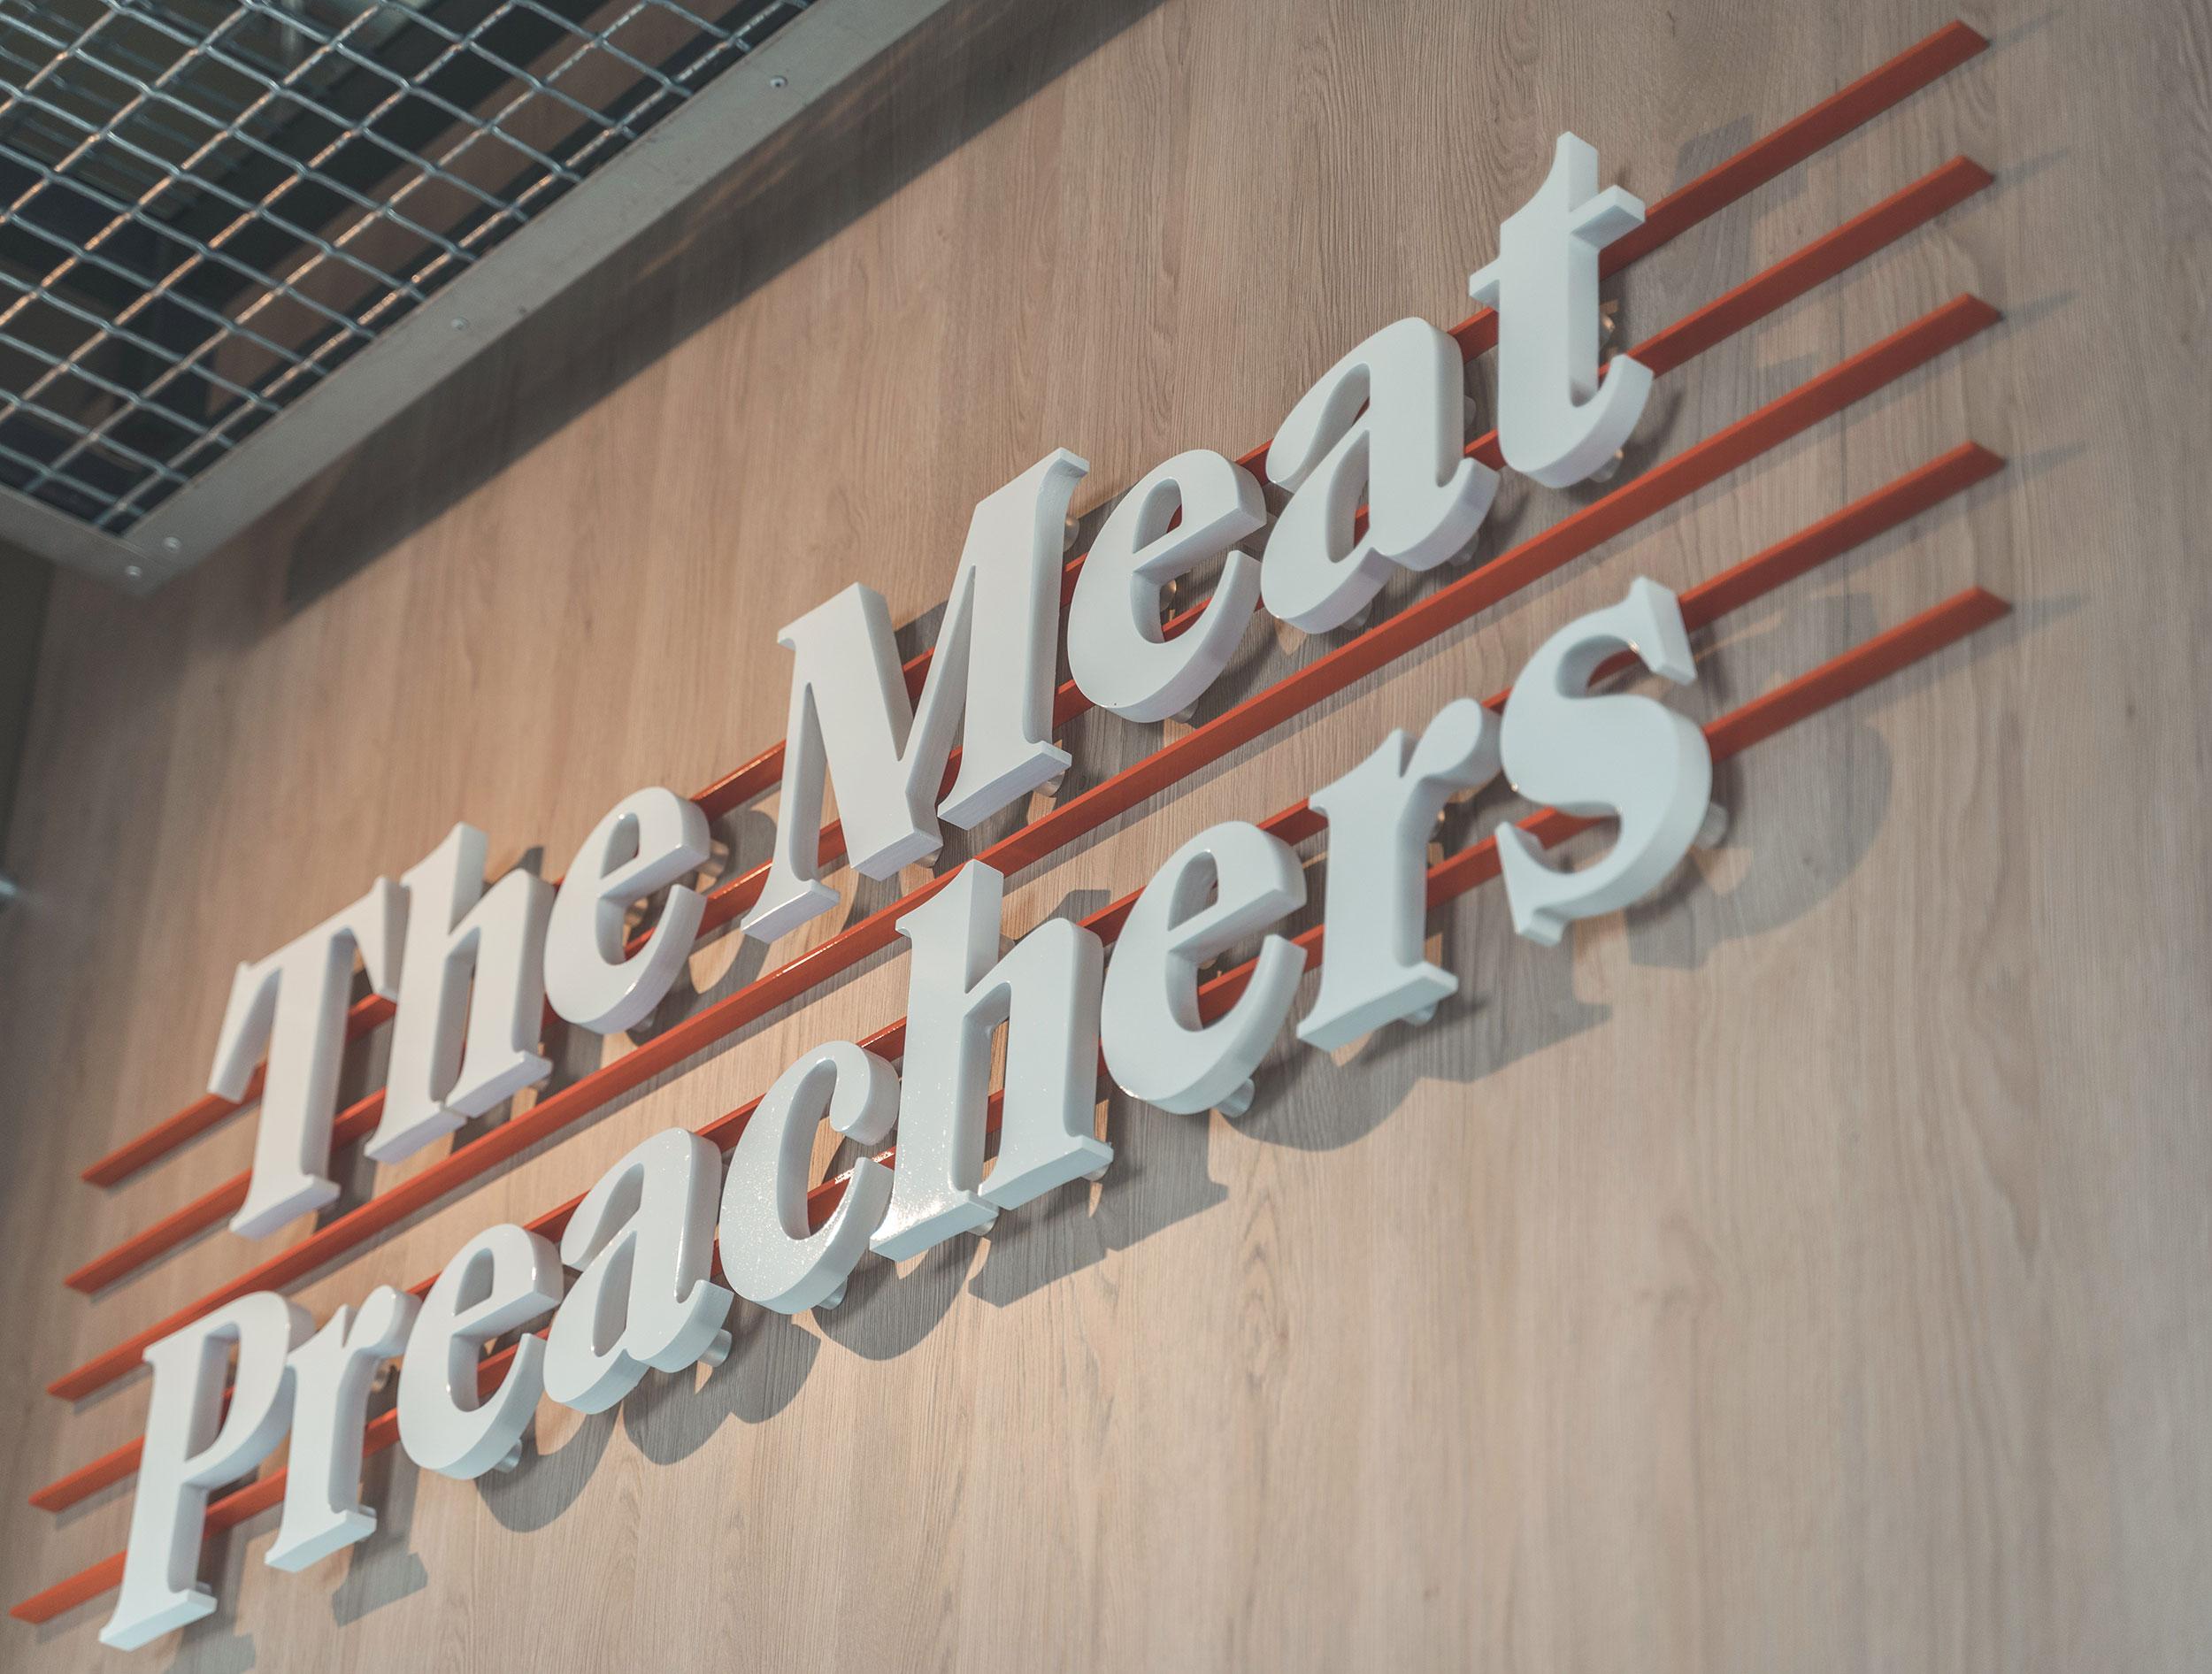 makebardo_The-Meat-Preachers-11.jpg